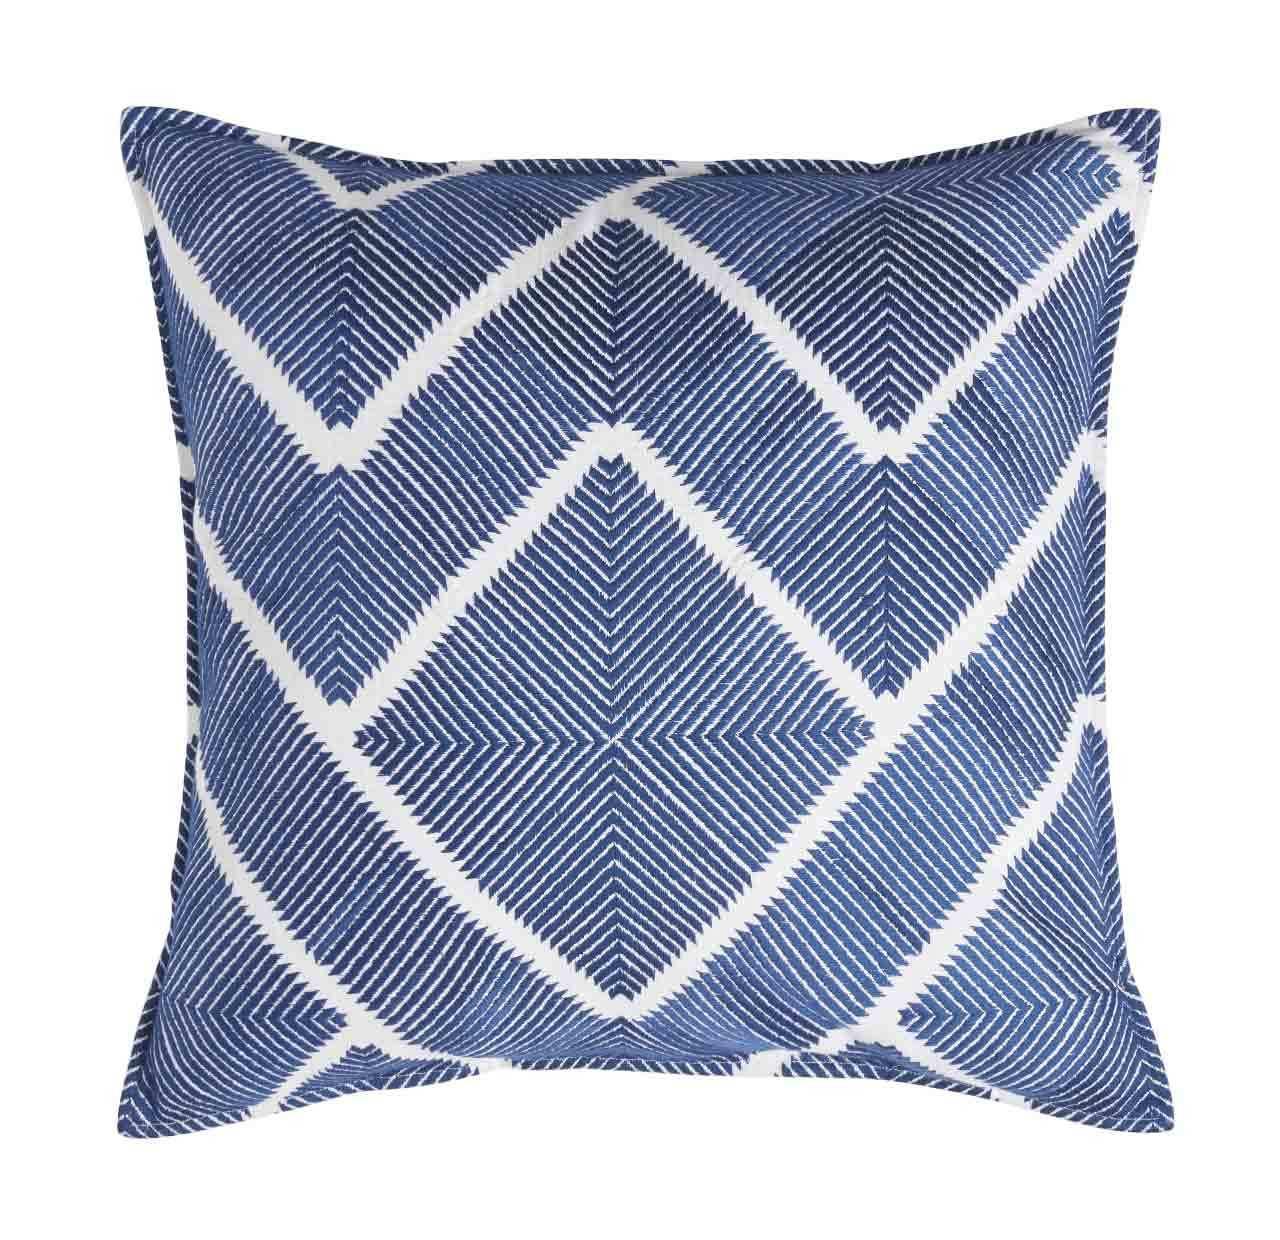 Wayfair Cushion - Pigment